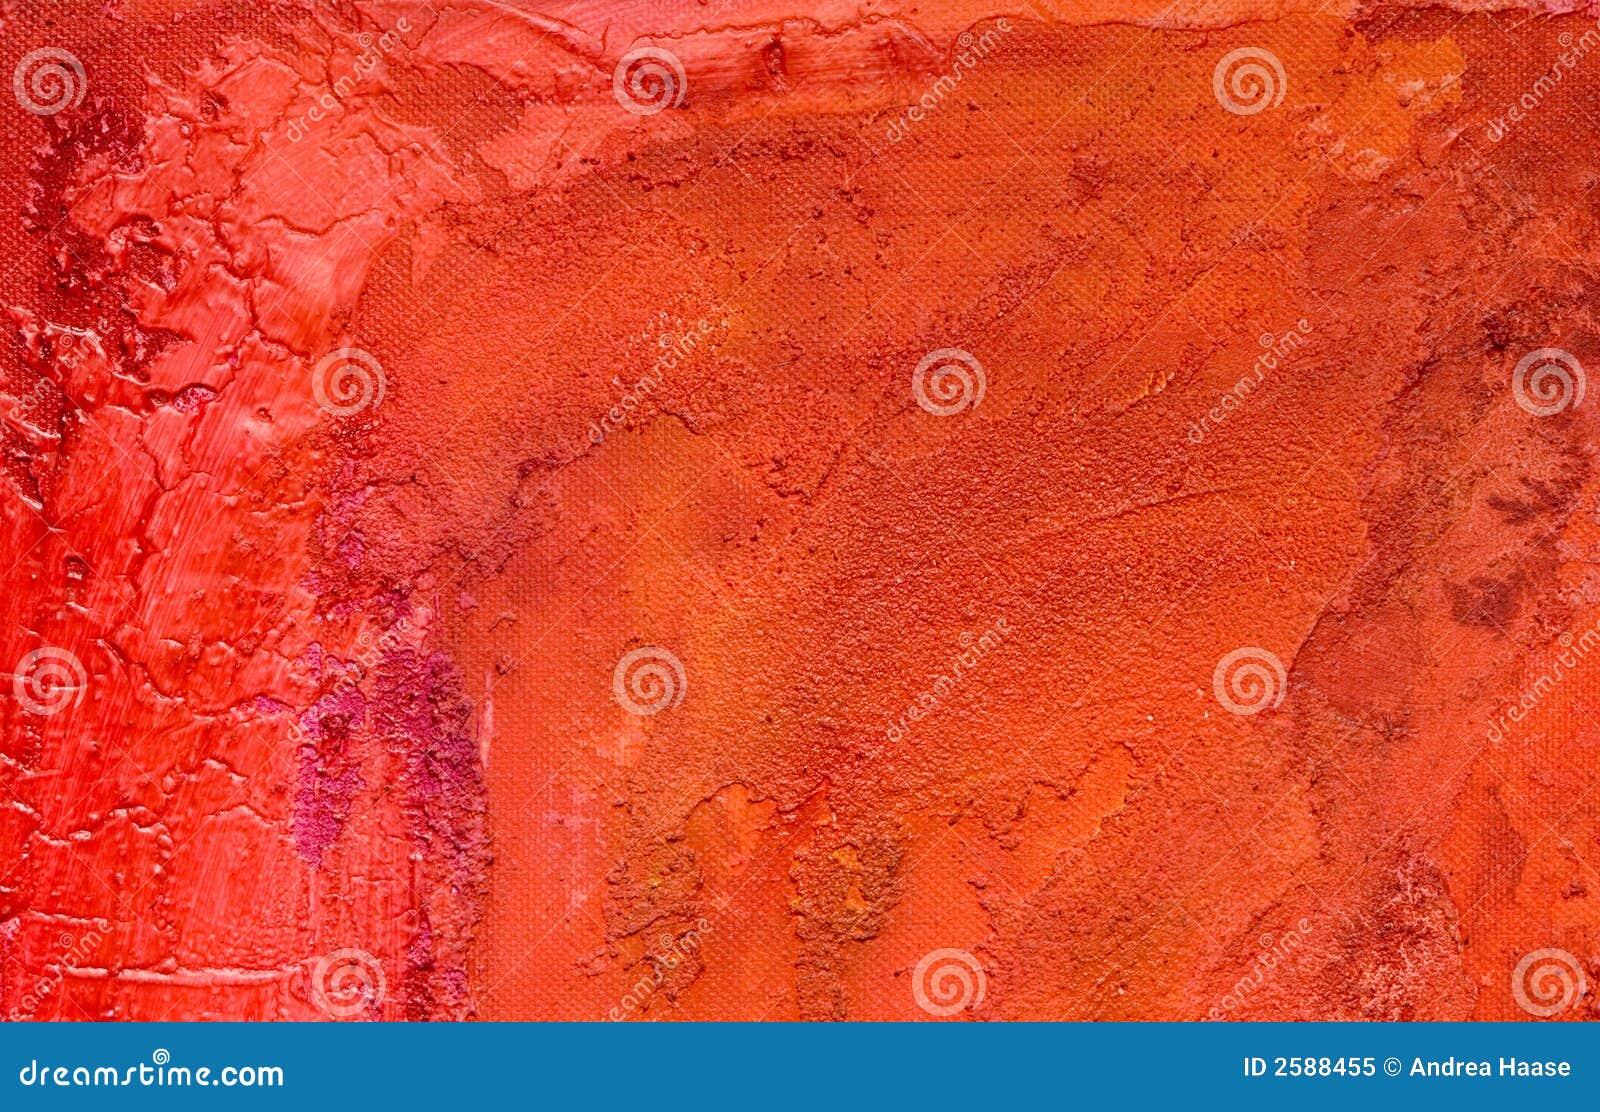 Rode geschilderde achtergrond